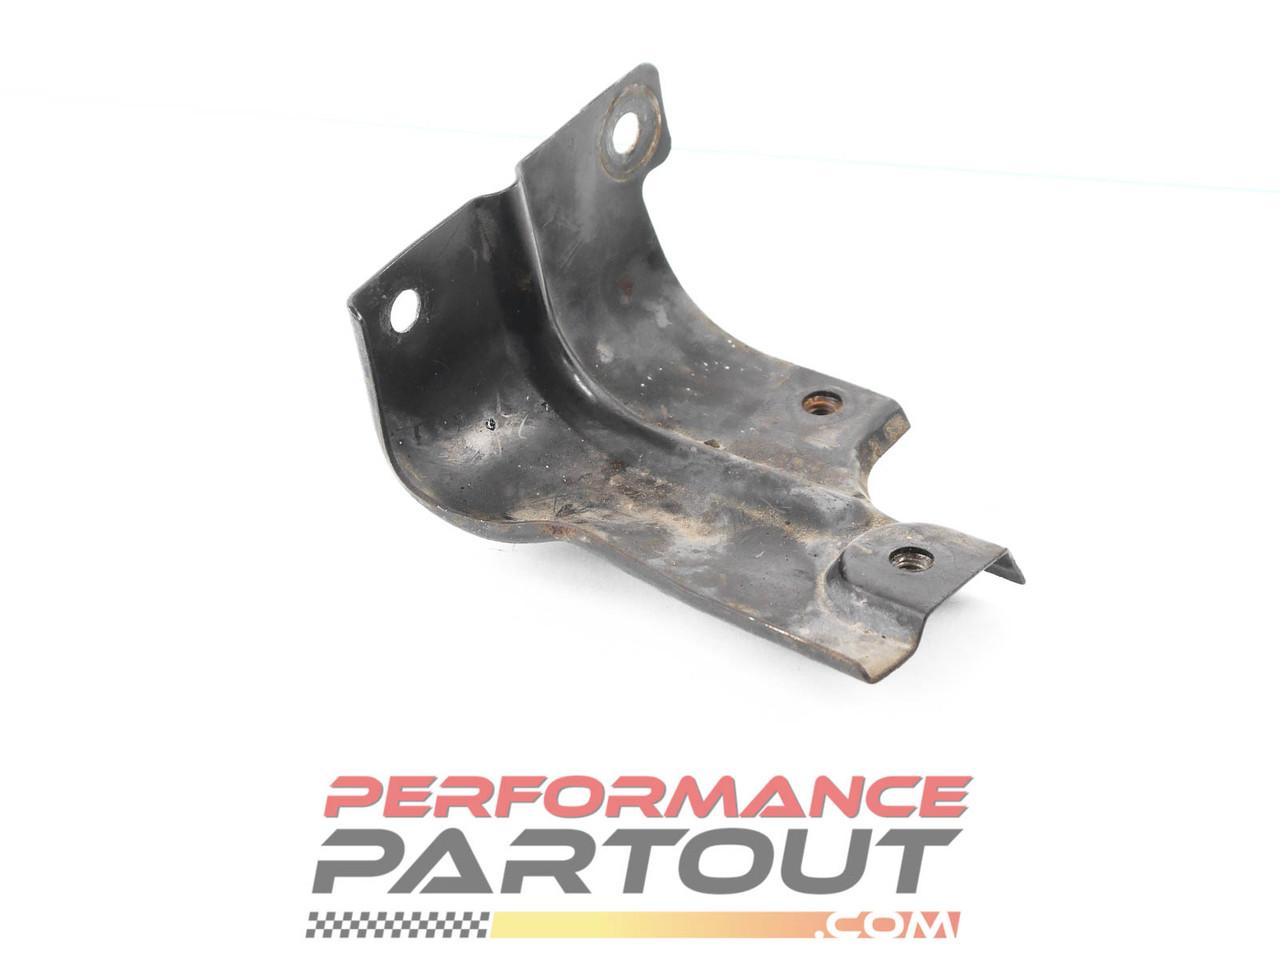 Fuse Box Mount Bracket 2G DSM under hood - Performance PartoutPerformance Partout